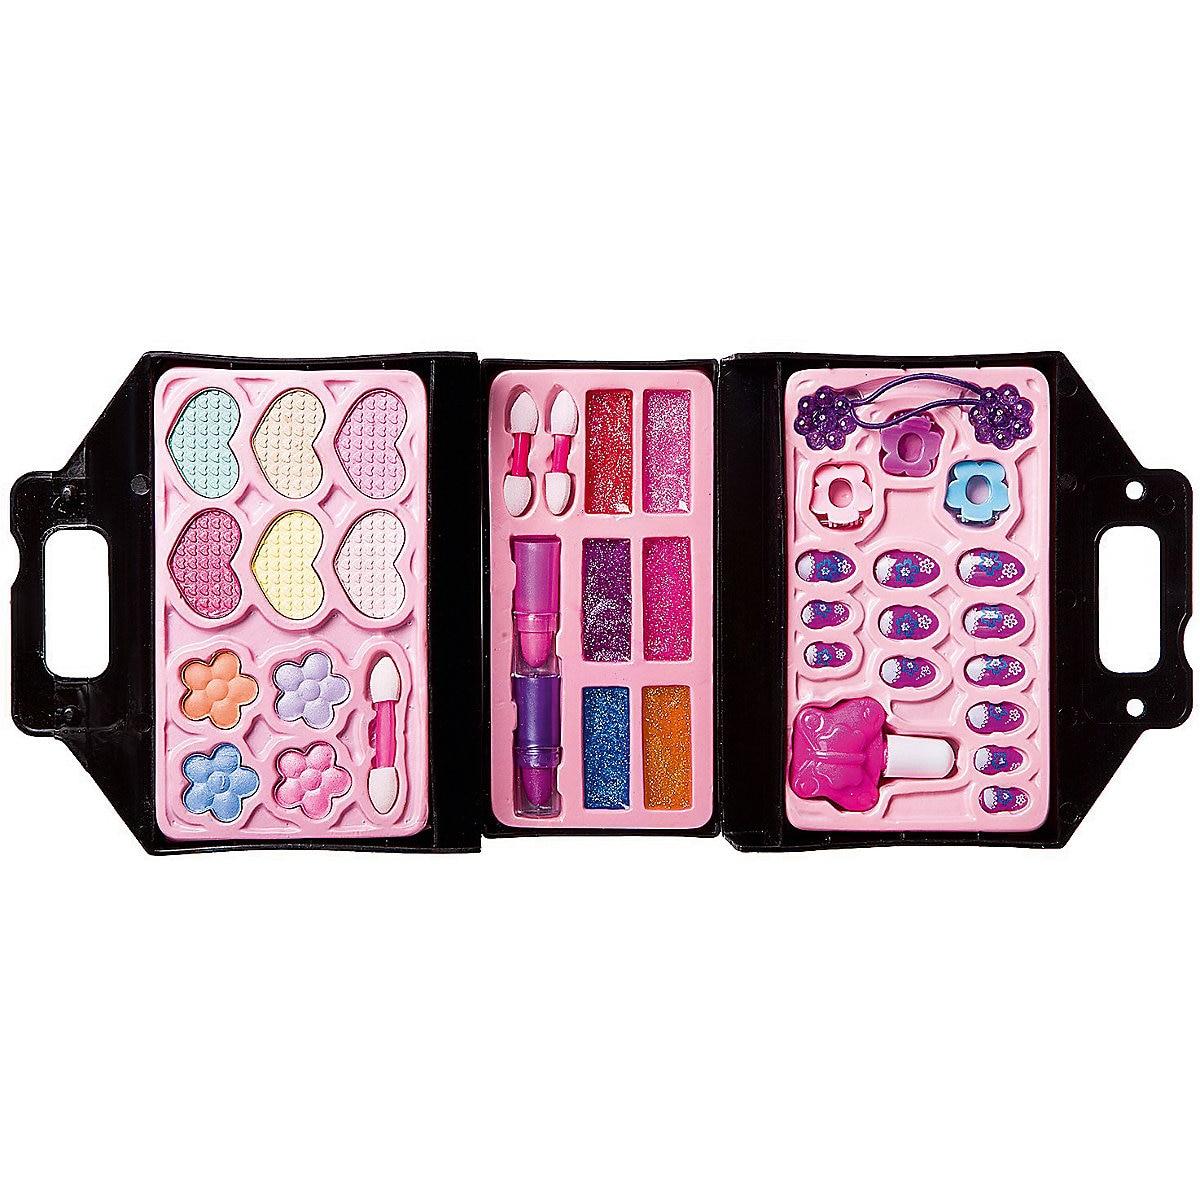 BONDIBON  Beauty & Fashion Toys 10078047 Cosmetics For Girl Makeup Sets Play Game